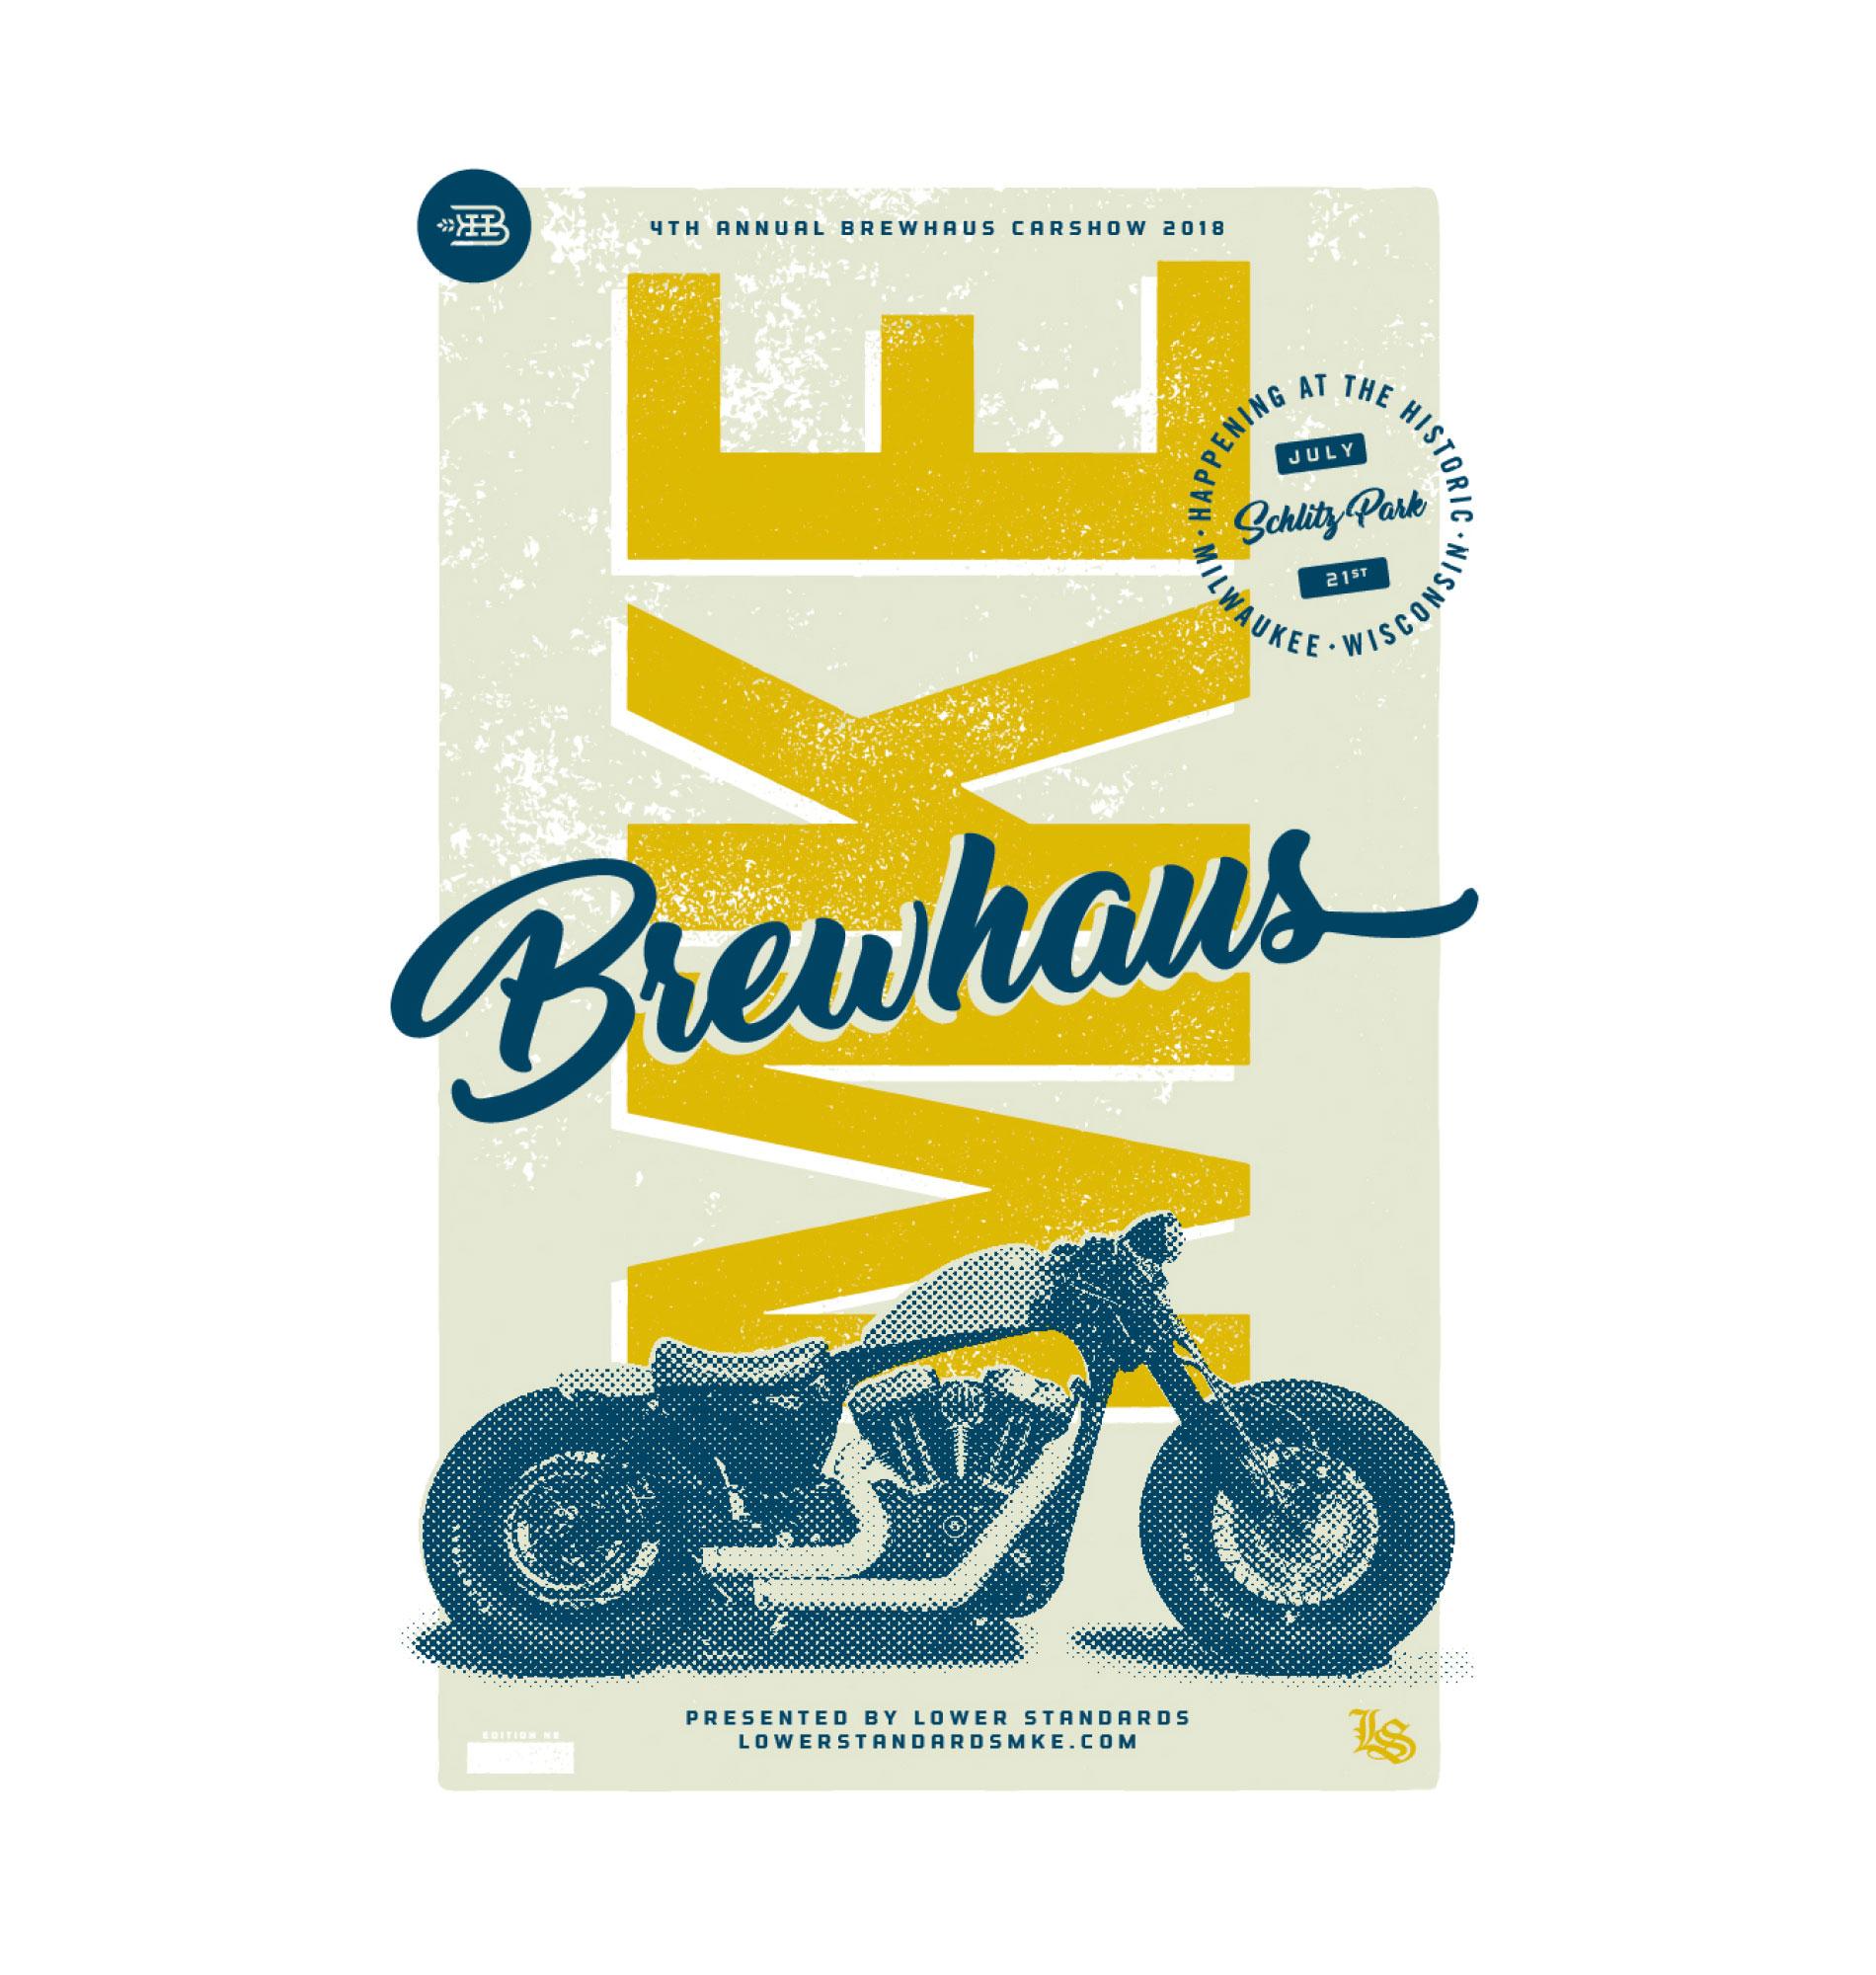 Brewhaus12